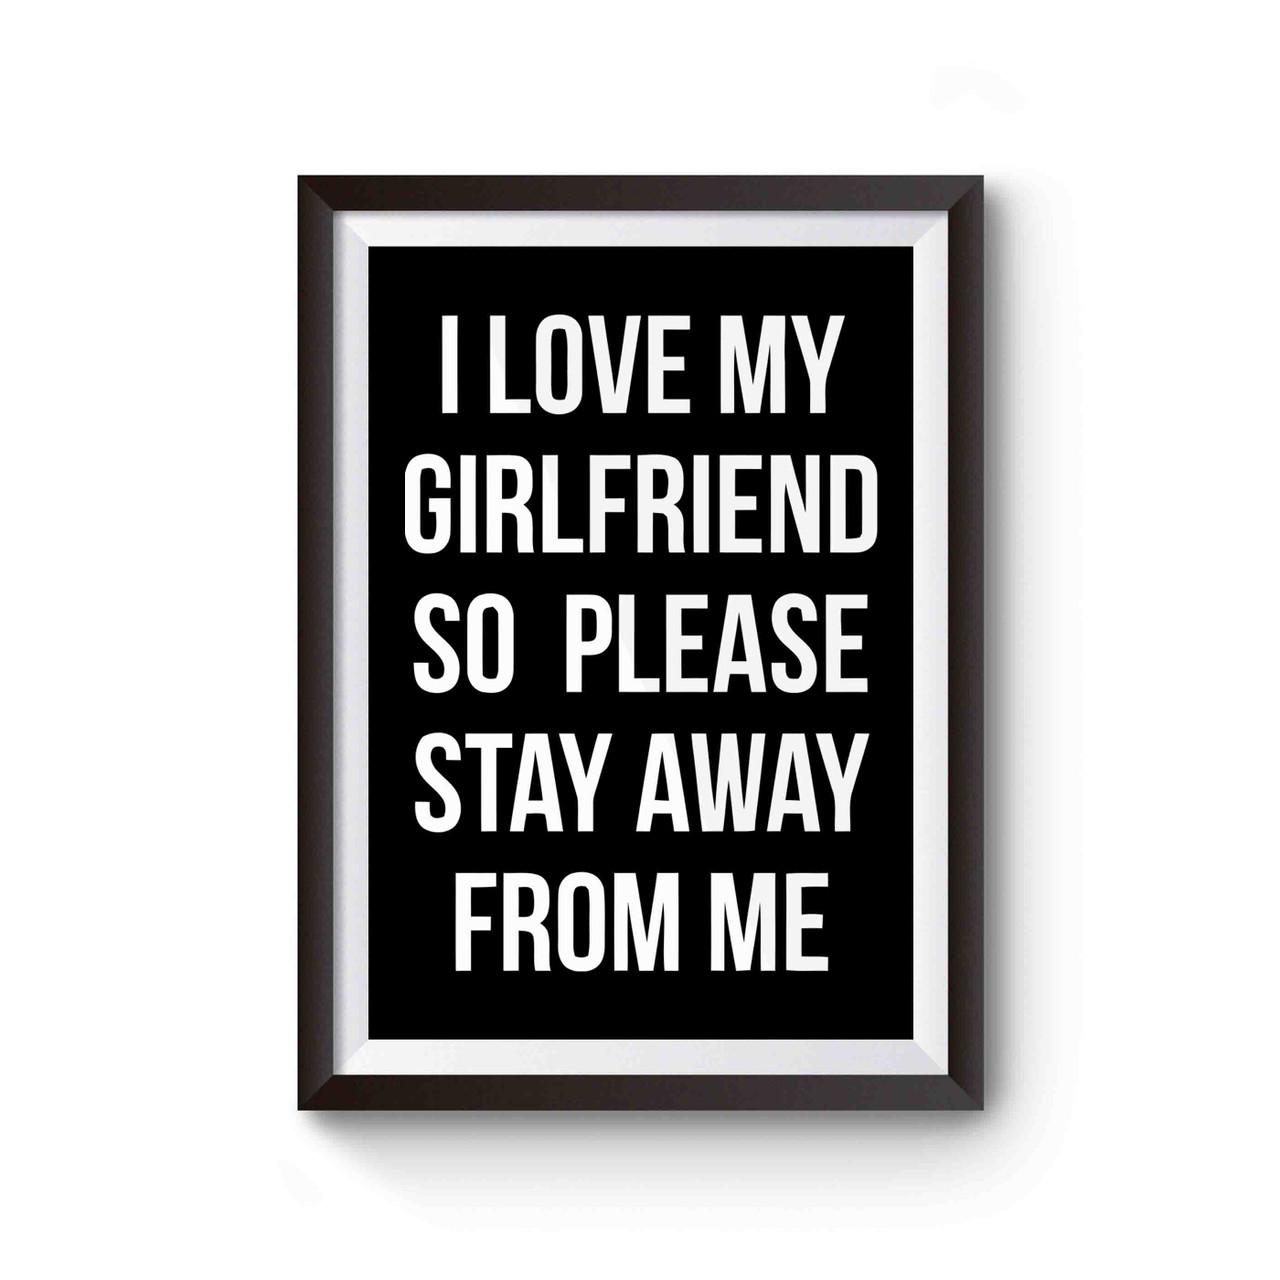 Girlfriend love my 27 Girlfriend